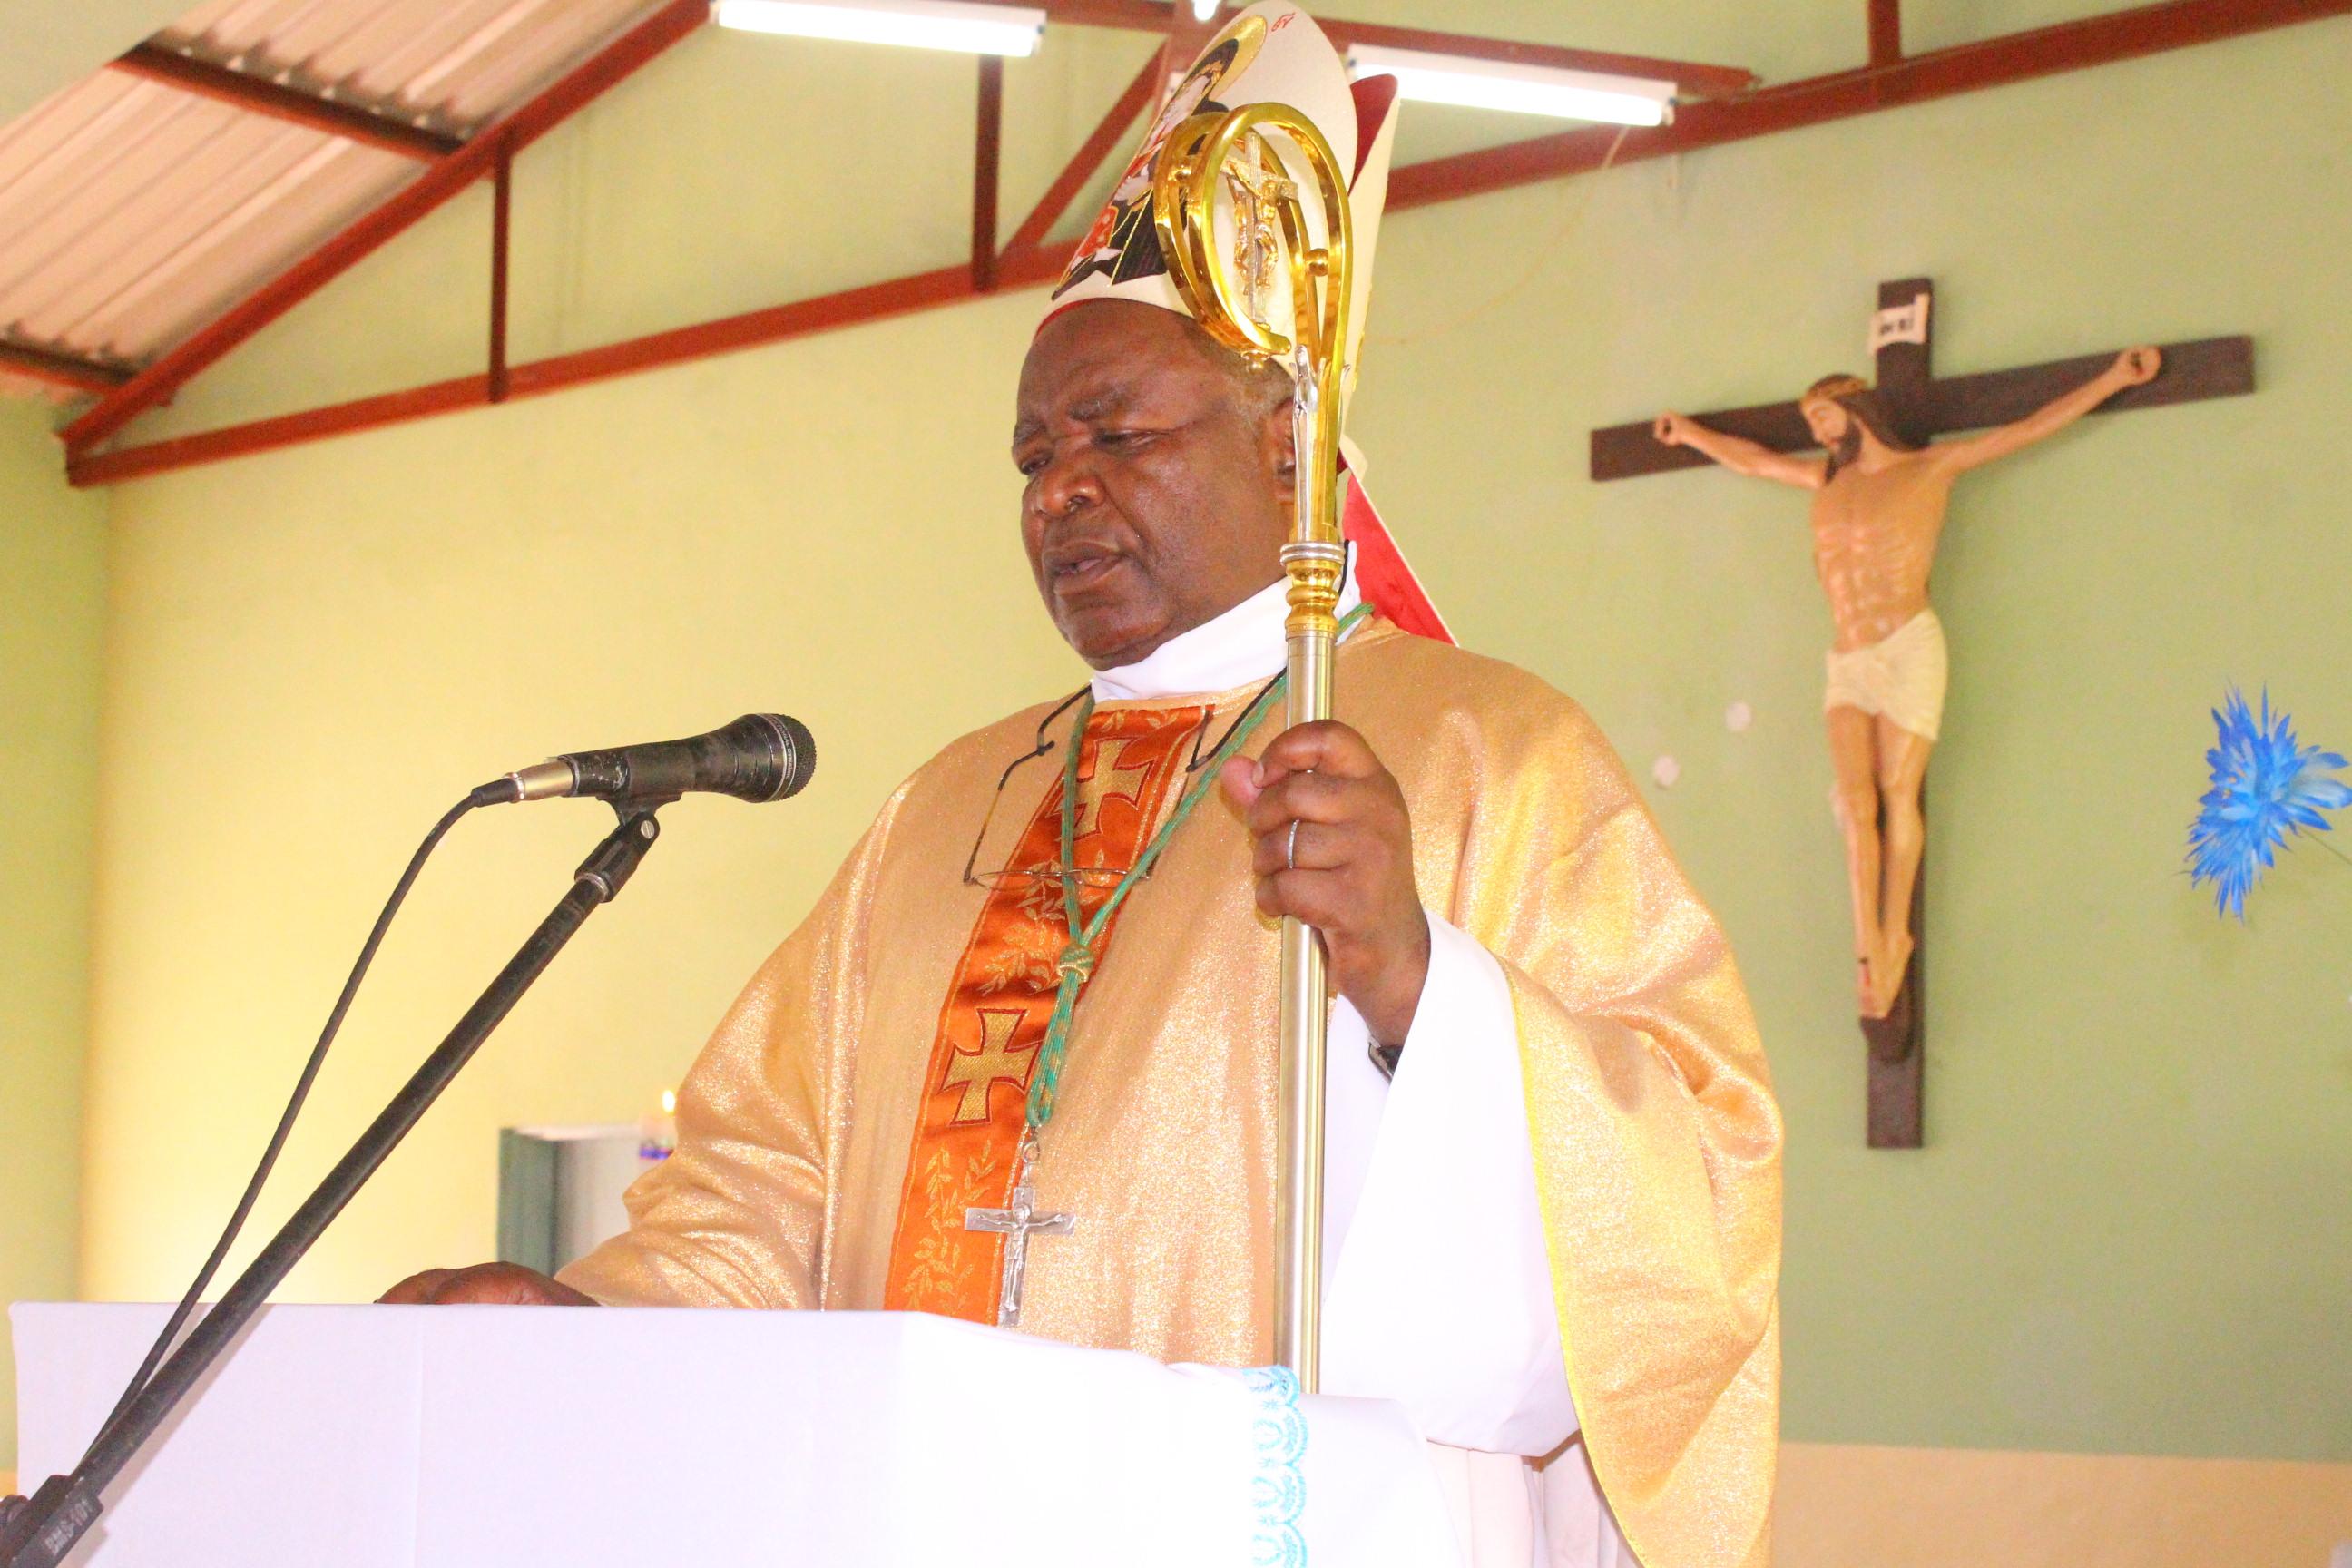 Bishop Mtumbuka Impressed With Peaceful Coexistence Among Religions